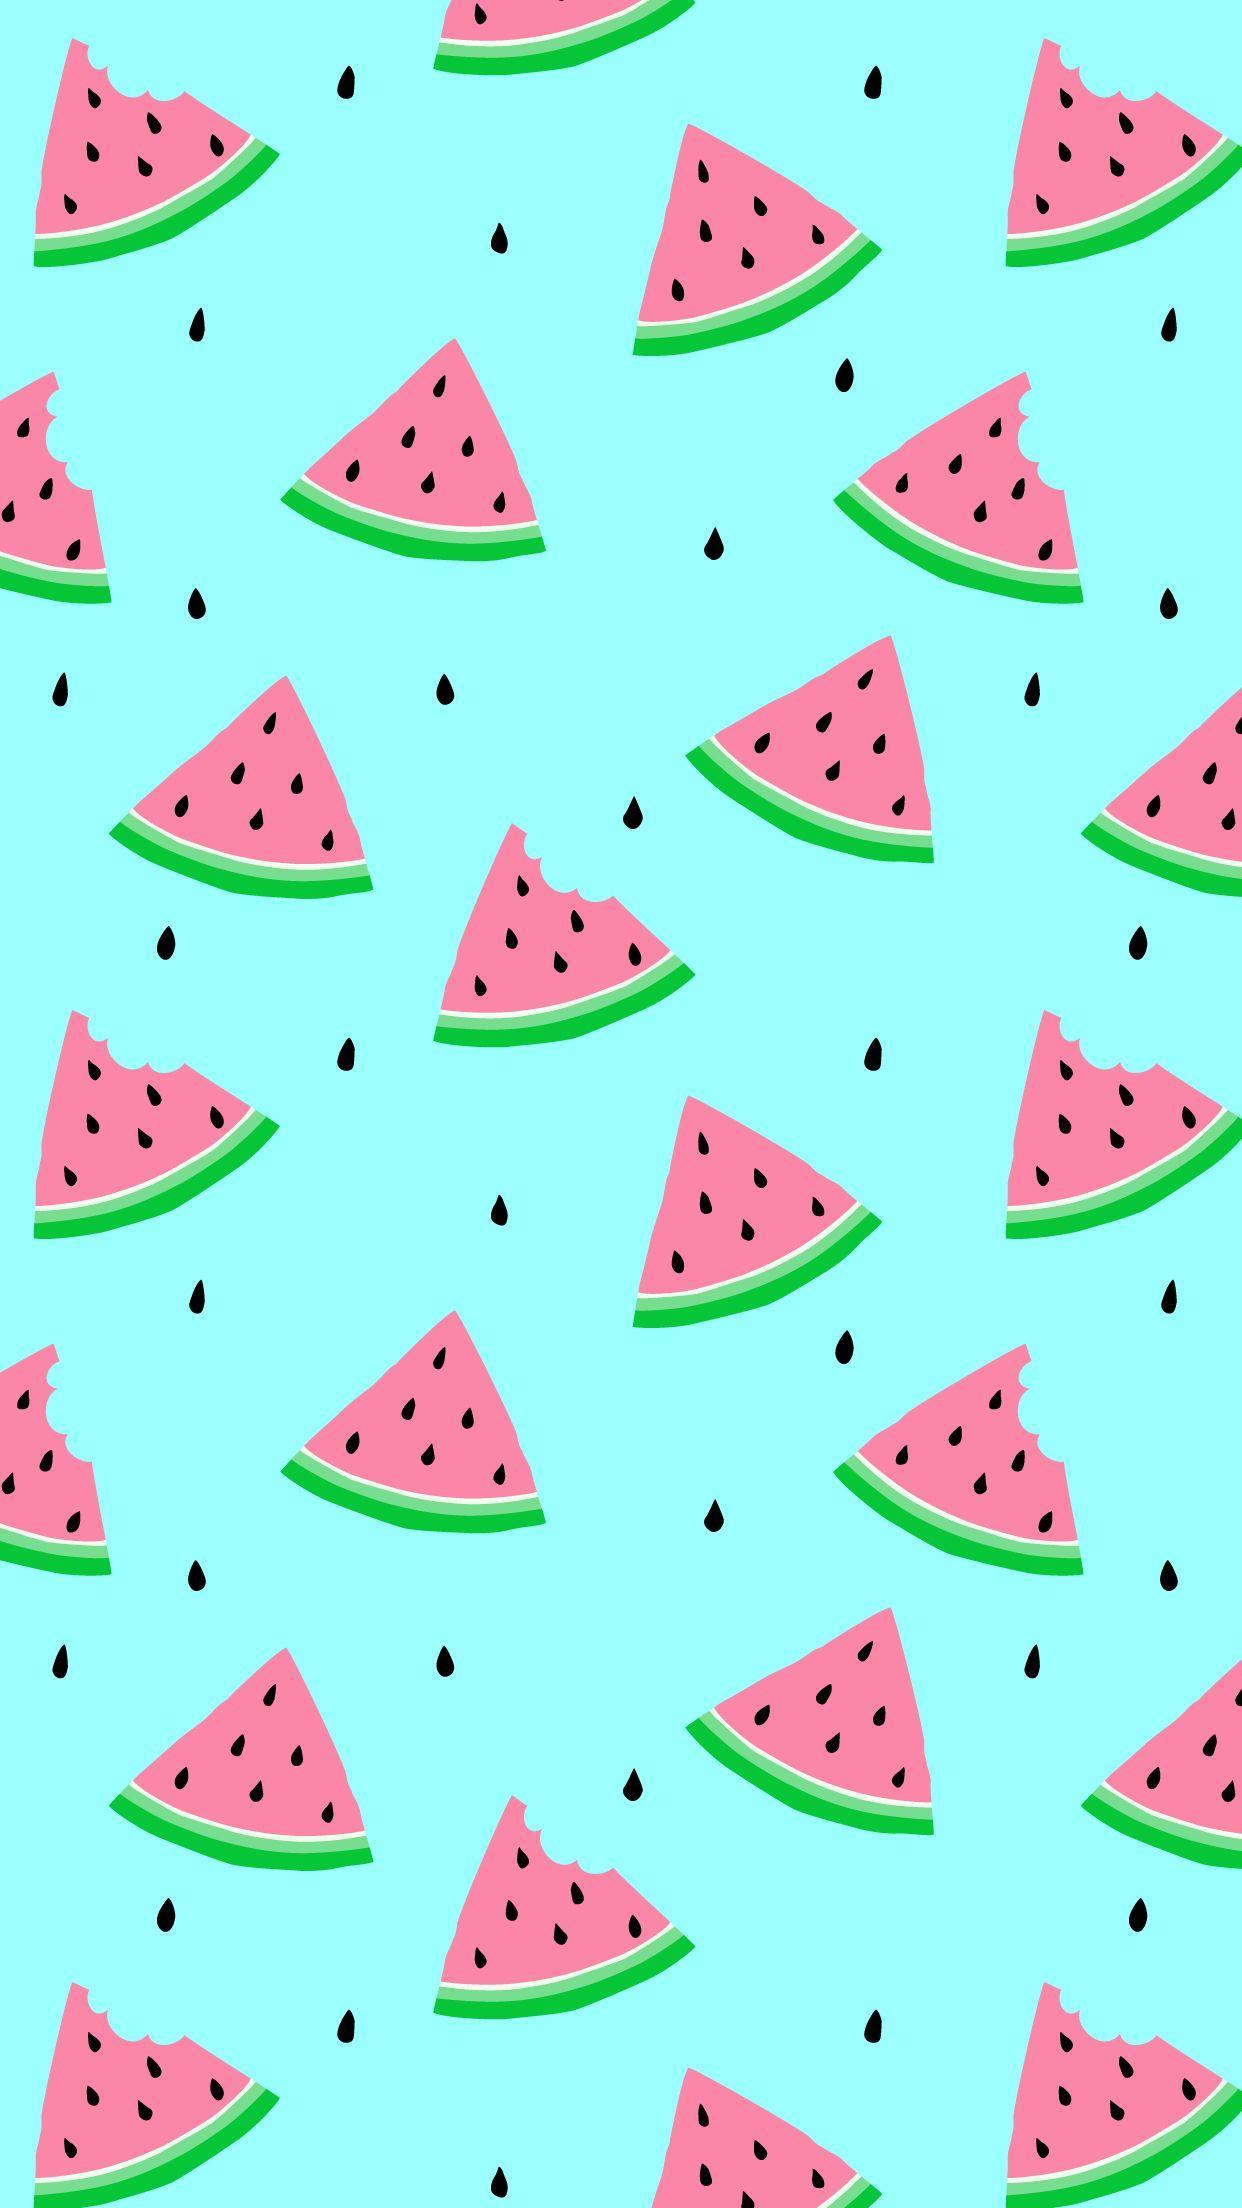 Pinterest Watermelon Wallpapers - Top Free Pinterest ...